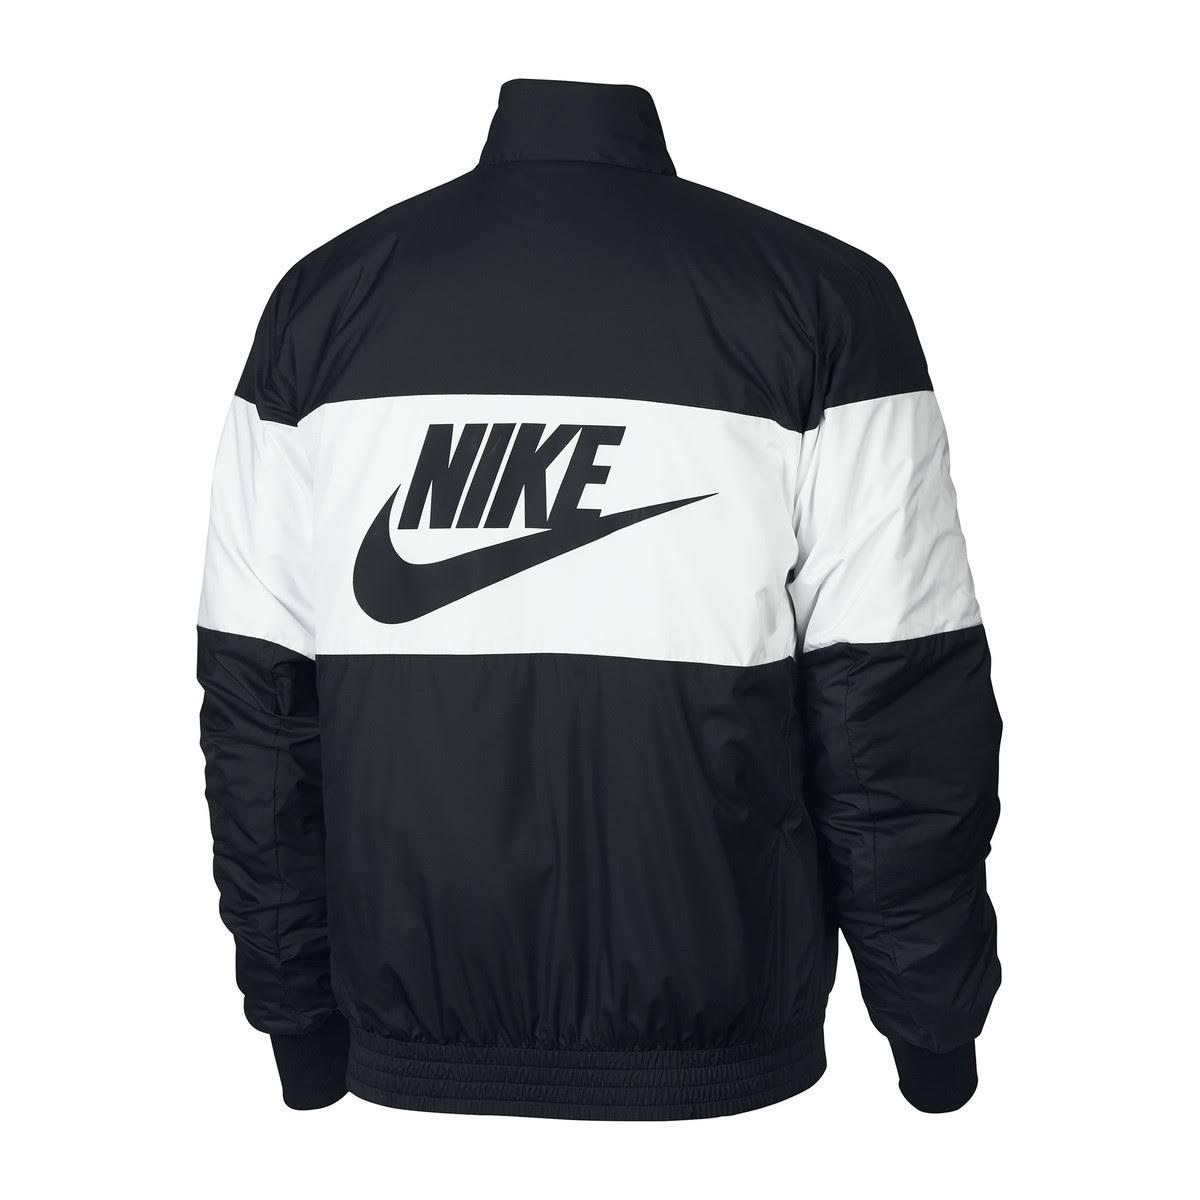 Giacca il Nike stile Aviatorcon cernieramotivo dietro nero K1TFJcl3